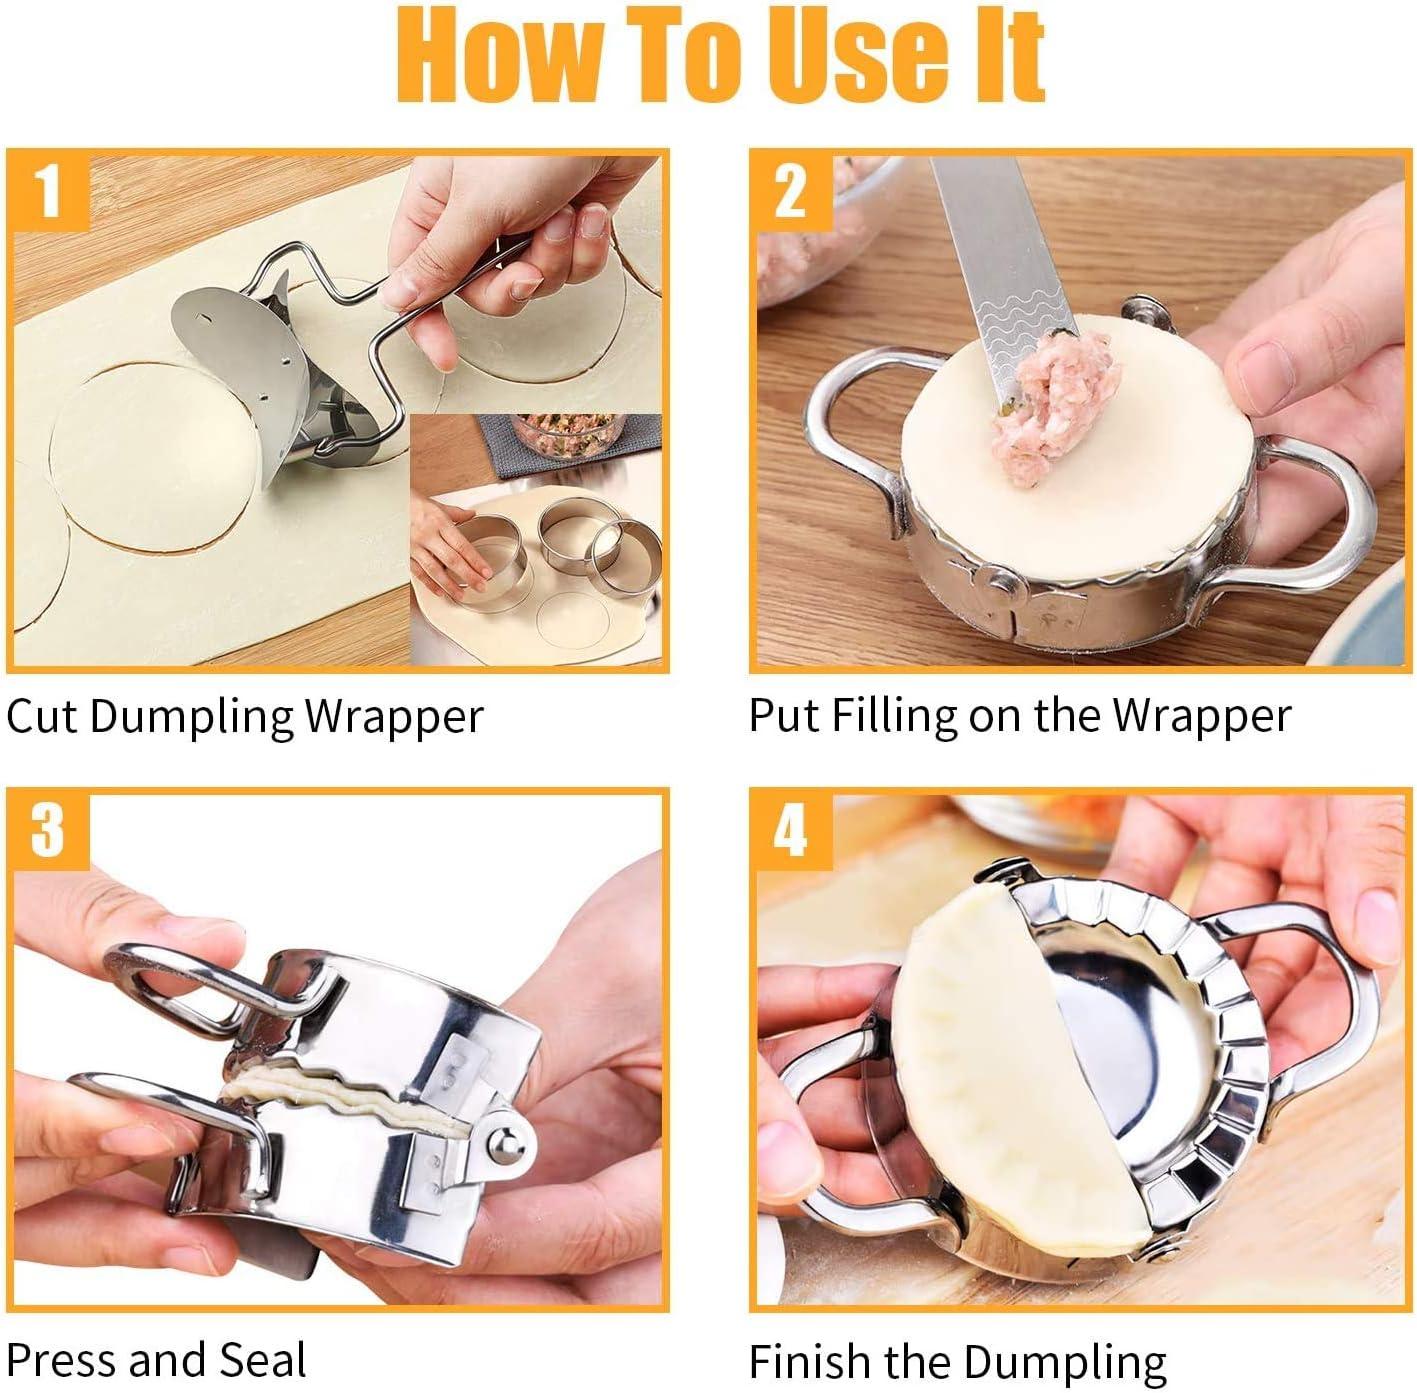 HIQE-FL Dough Press Set,Ravioli Maker,Dumpling Maker Set,Dumpling Maker Maschine,Dumplings Wrapper,Ravioli Biscuit Cutters,Kn/ödel-Hersteller,Dumpling Cutter,Geb/äck-Werkzeuge